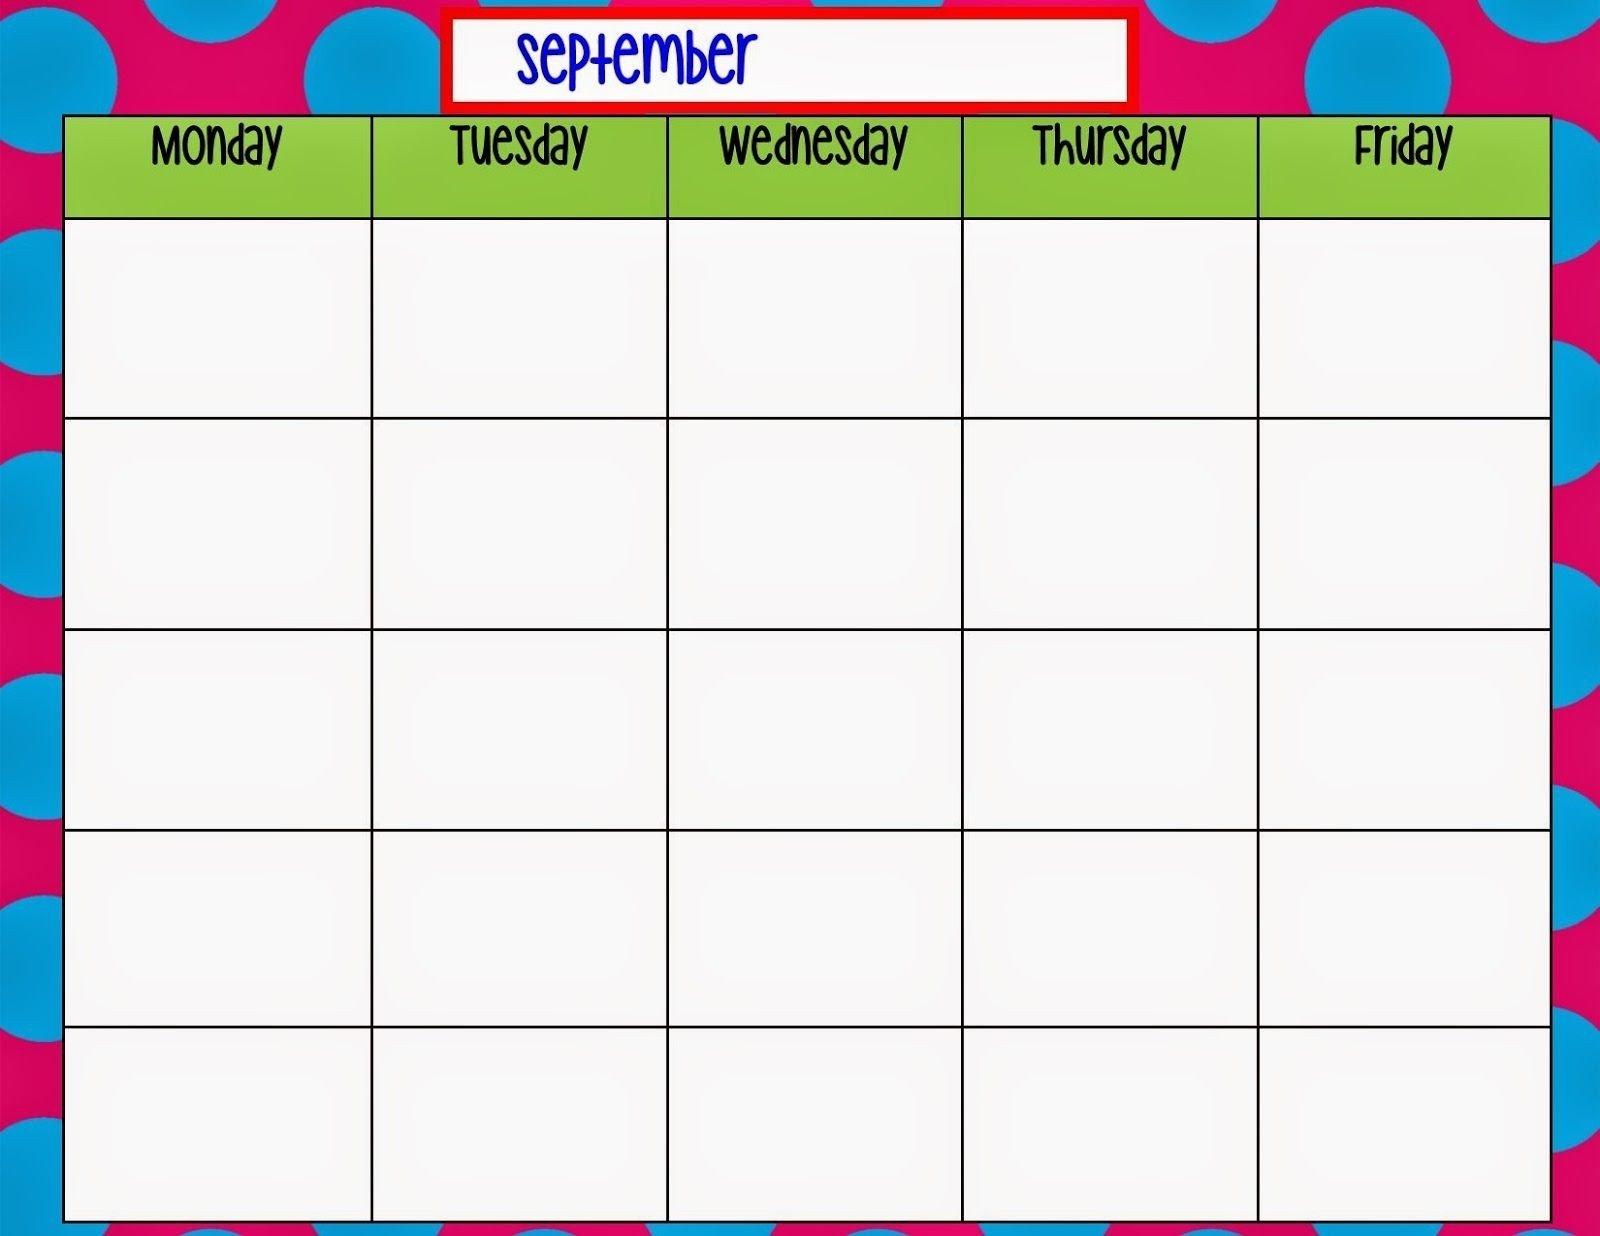 Monday To Friday Blank Calendar Printable | Calendar Monday To Friday Blank Week Schedule